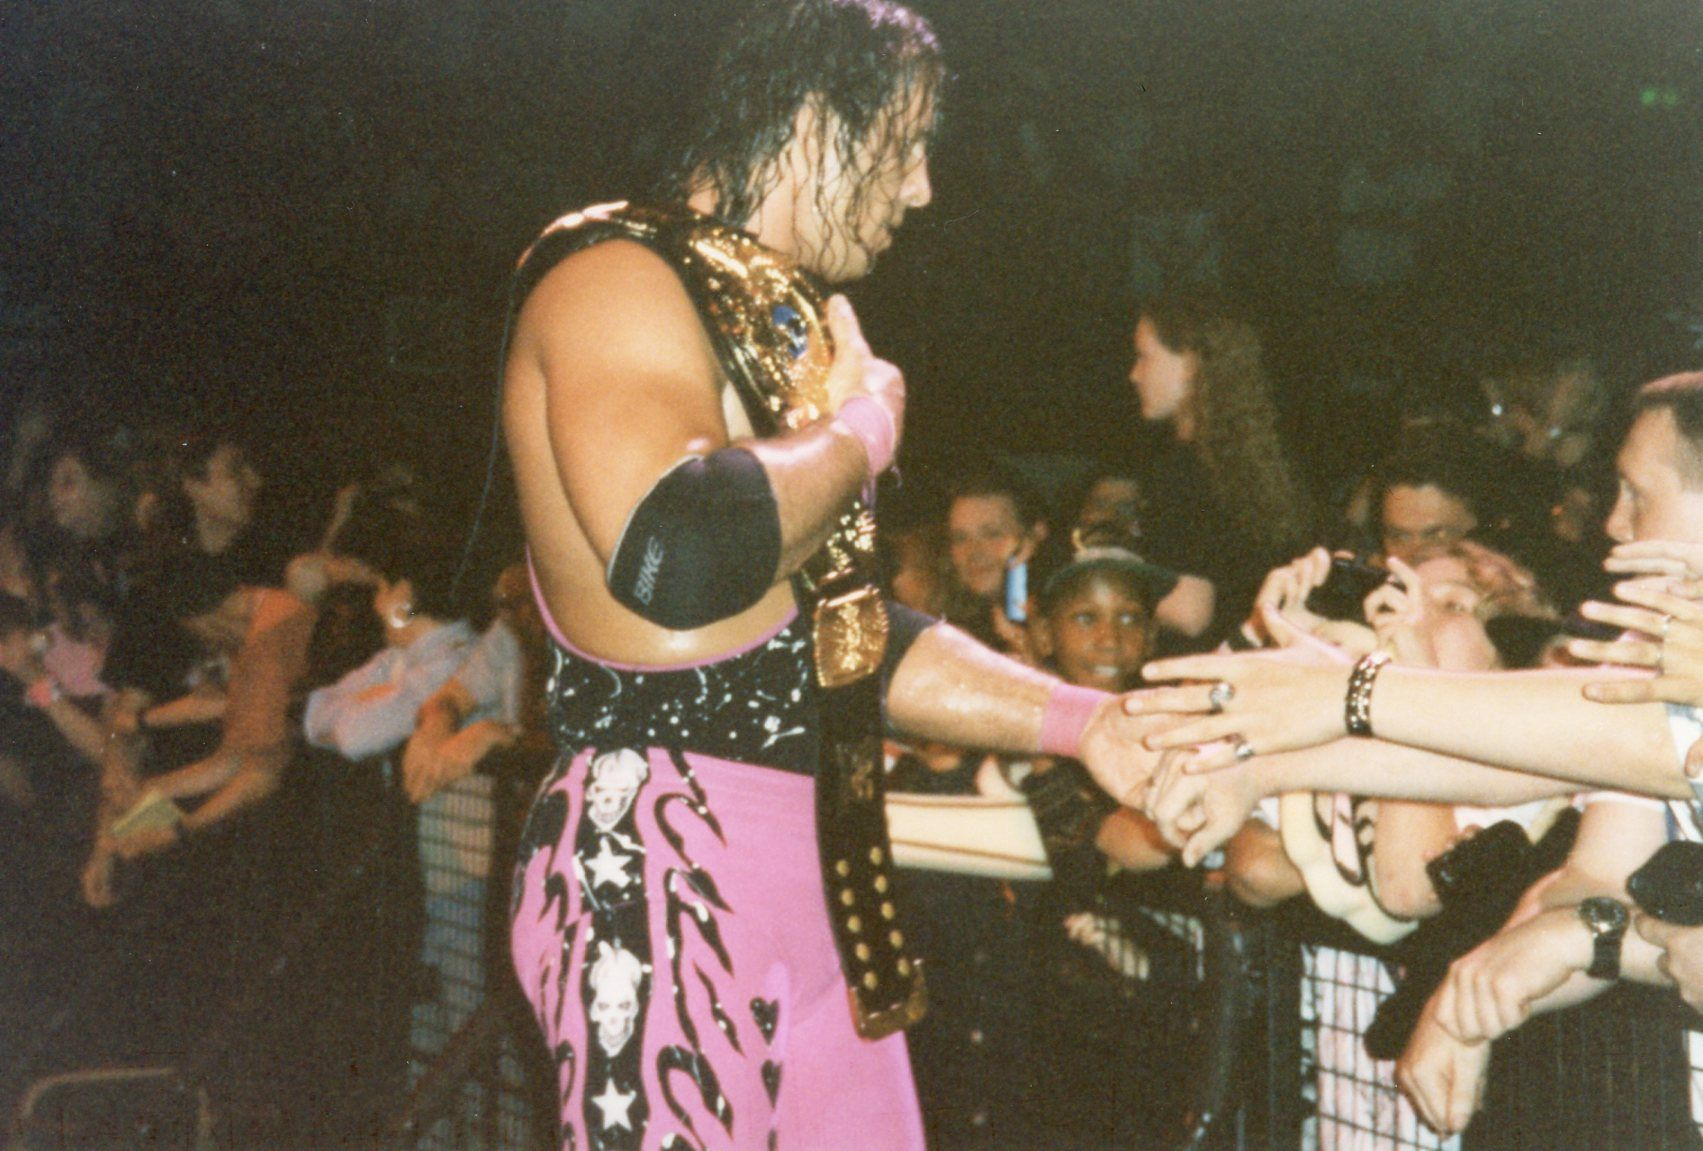 9. Bret Hart, Kane, Mankind: 1 day